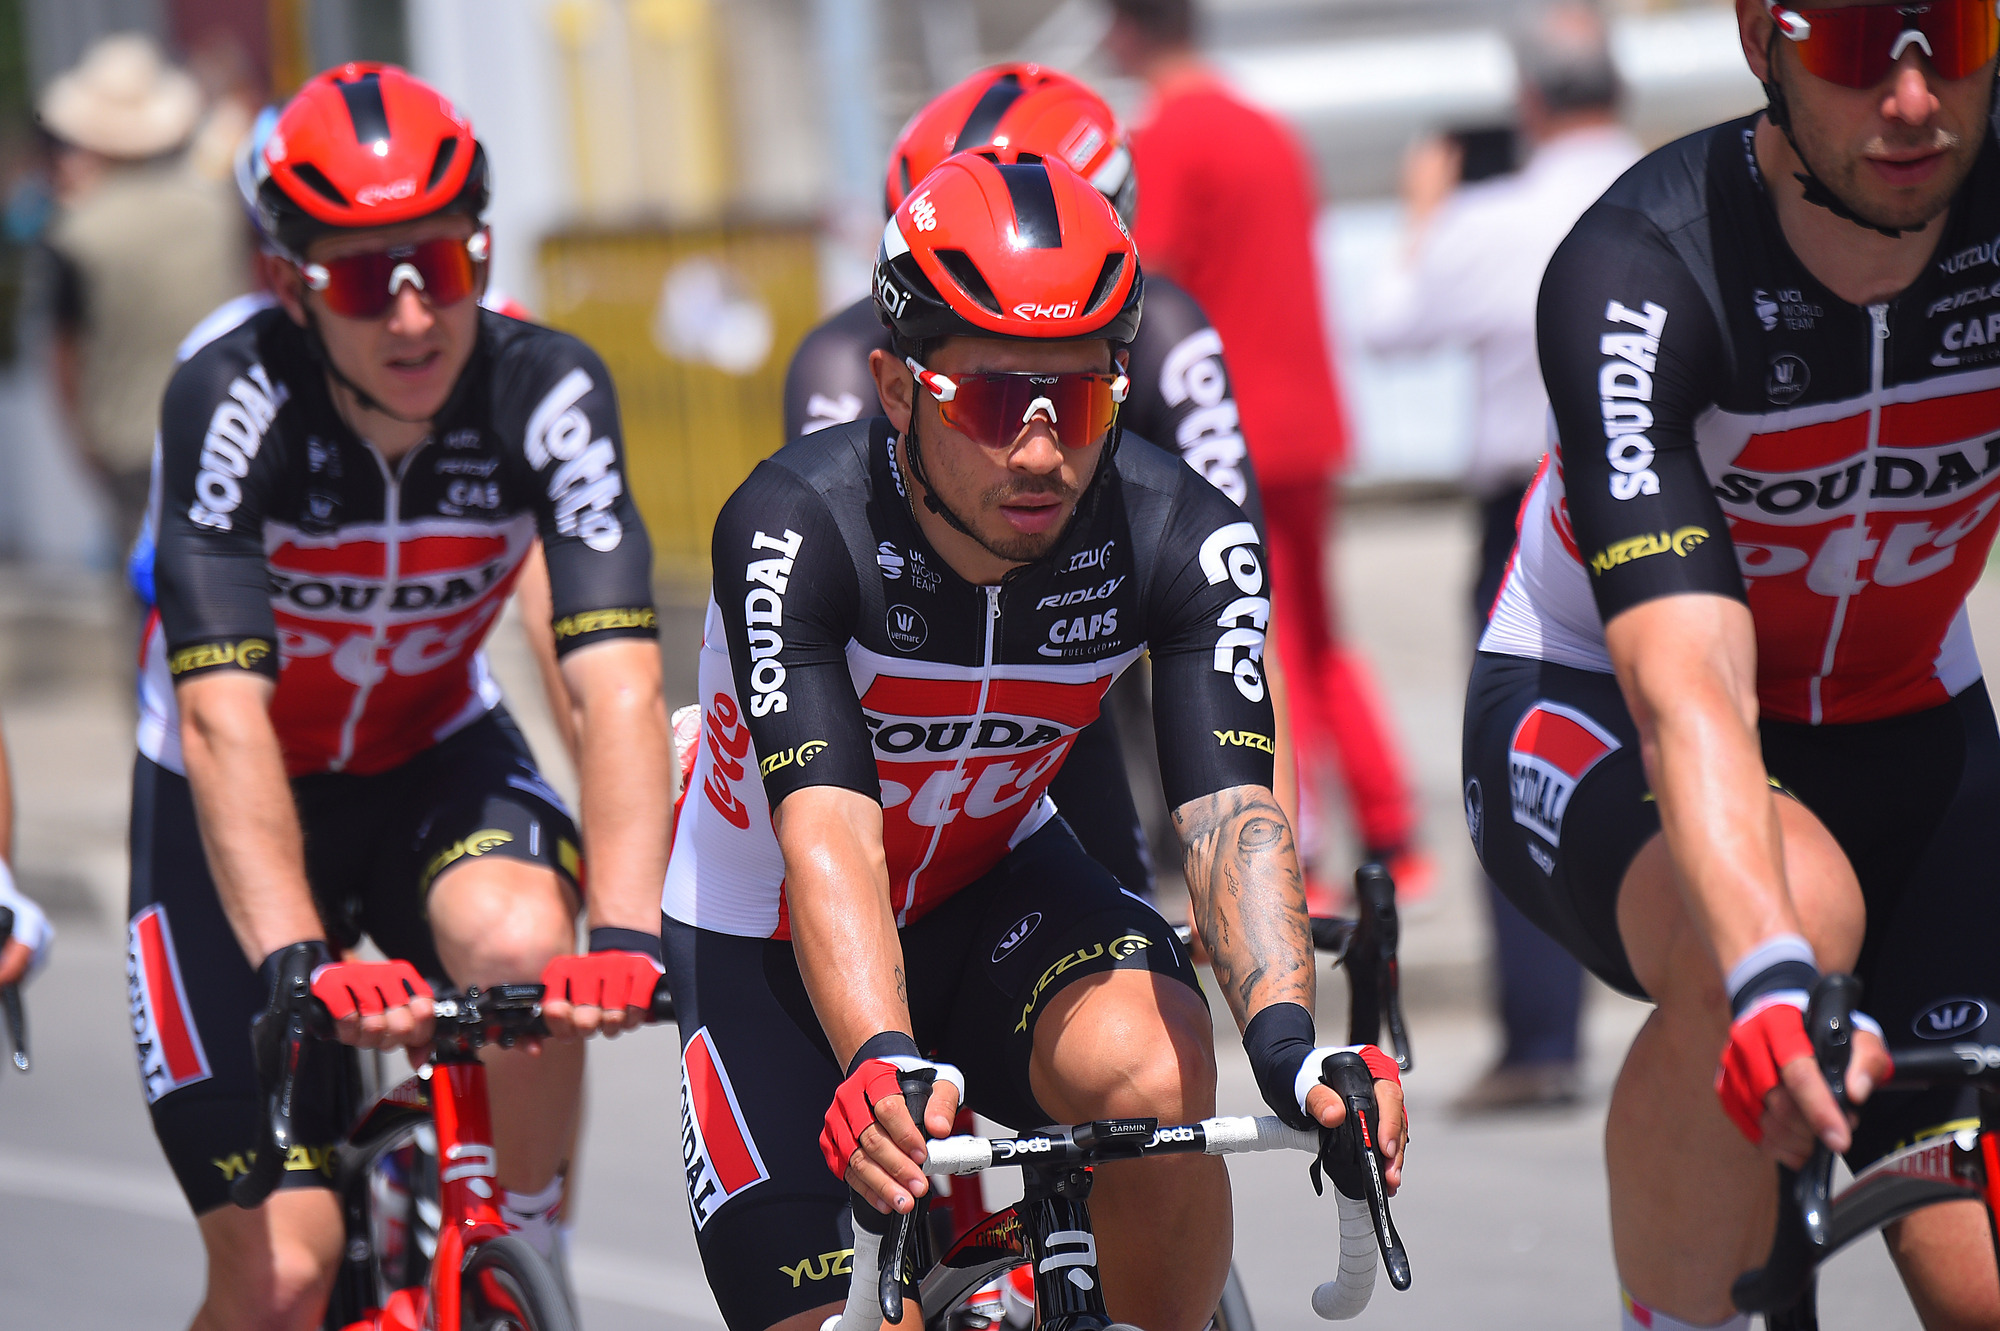 Giro dItalia 2021 104th Edition 7th stage Notaresco Termoli 181 km 14052021 Caleb Ewan AUS Lotto Soudal photo Dario BelingheriBettiniPhoto2021